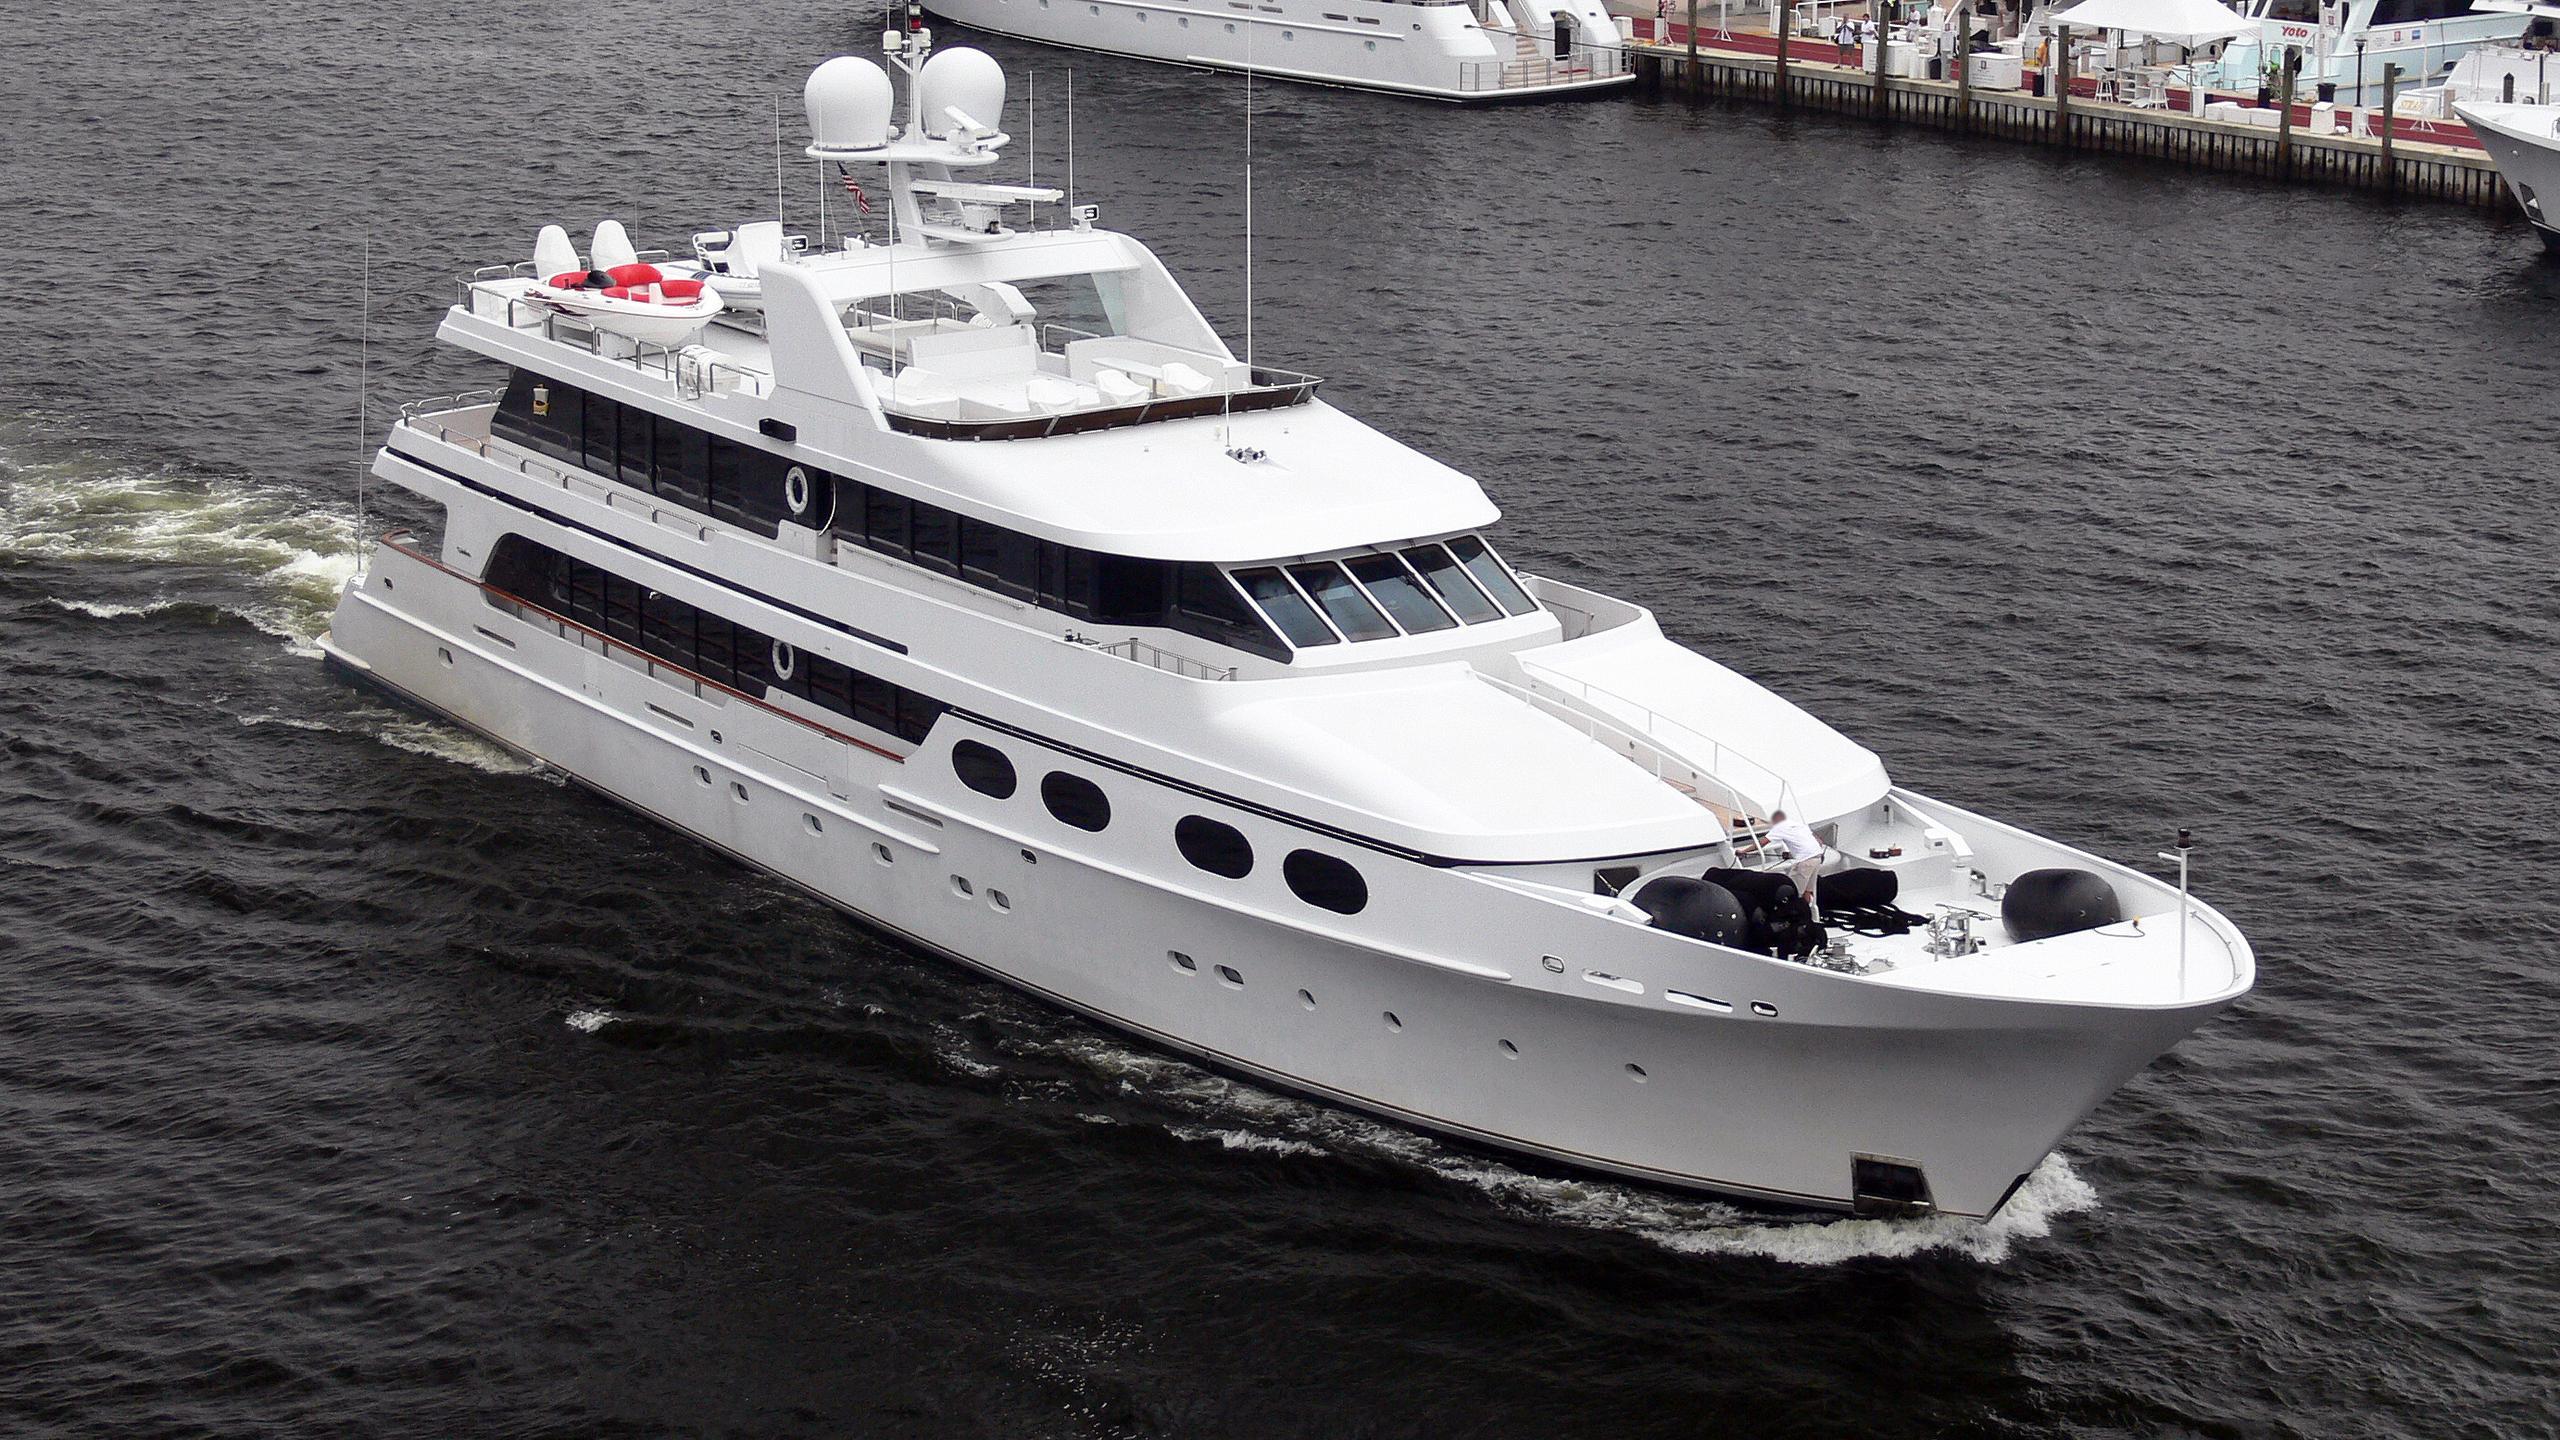 loon-abbracci-motor-yacht-christensen-155-1997-47m-half-profile-before-refit